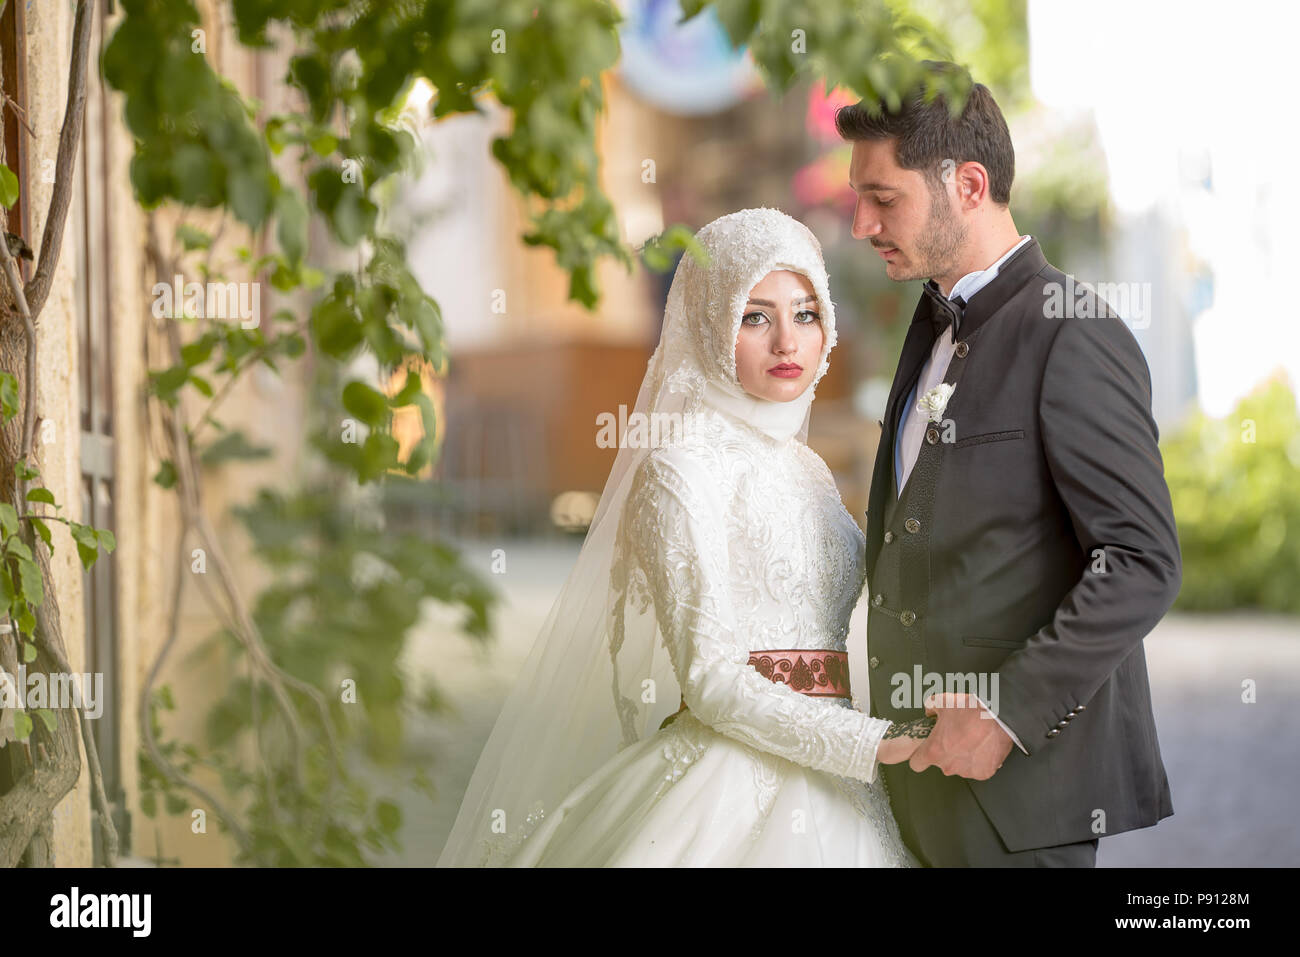 Muslim bride and groom Islamic wedding ceremony Middle